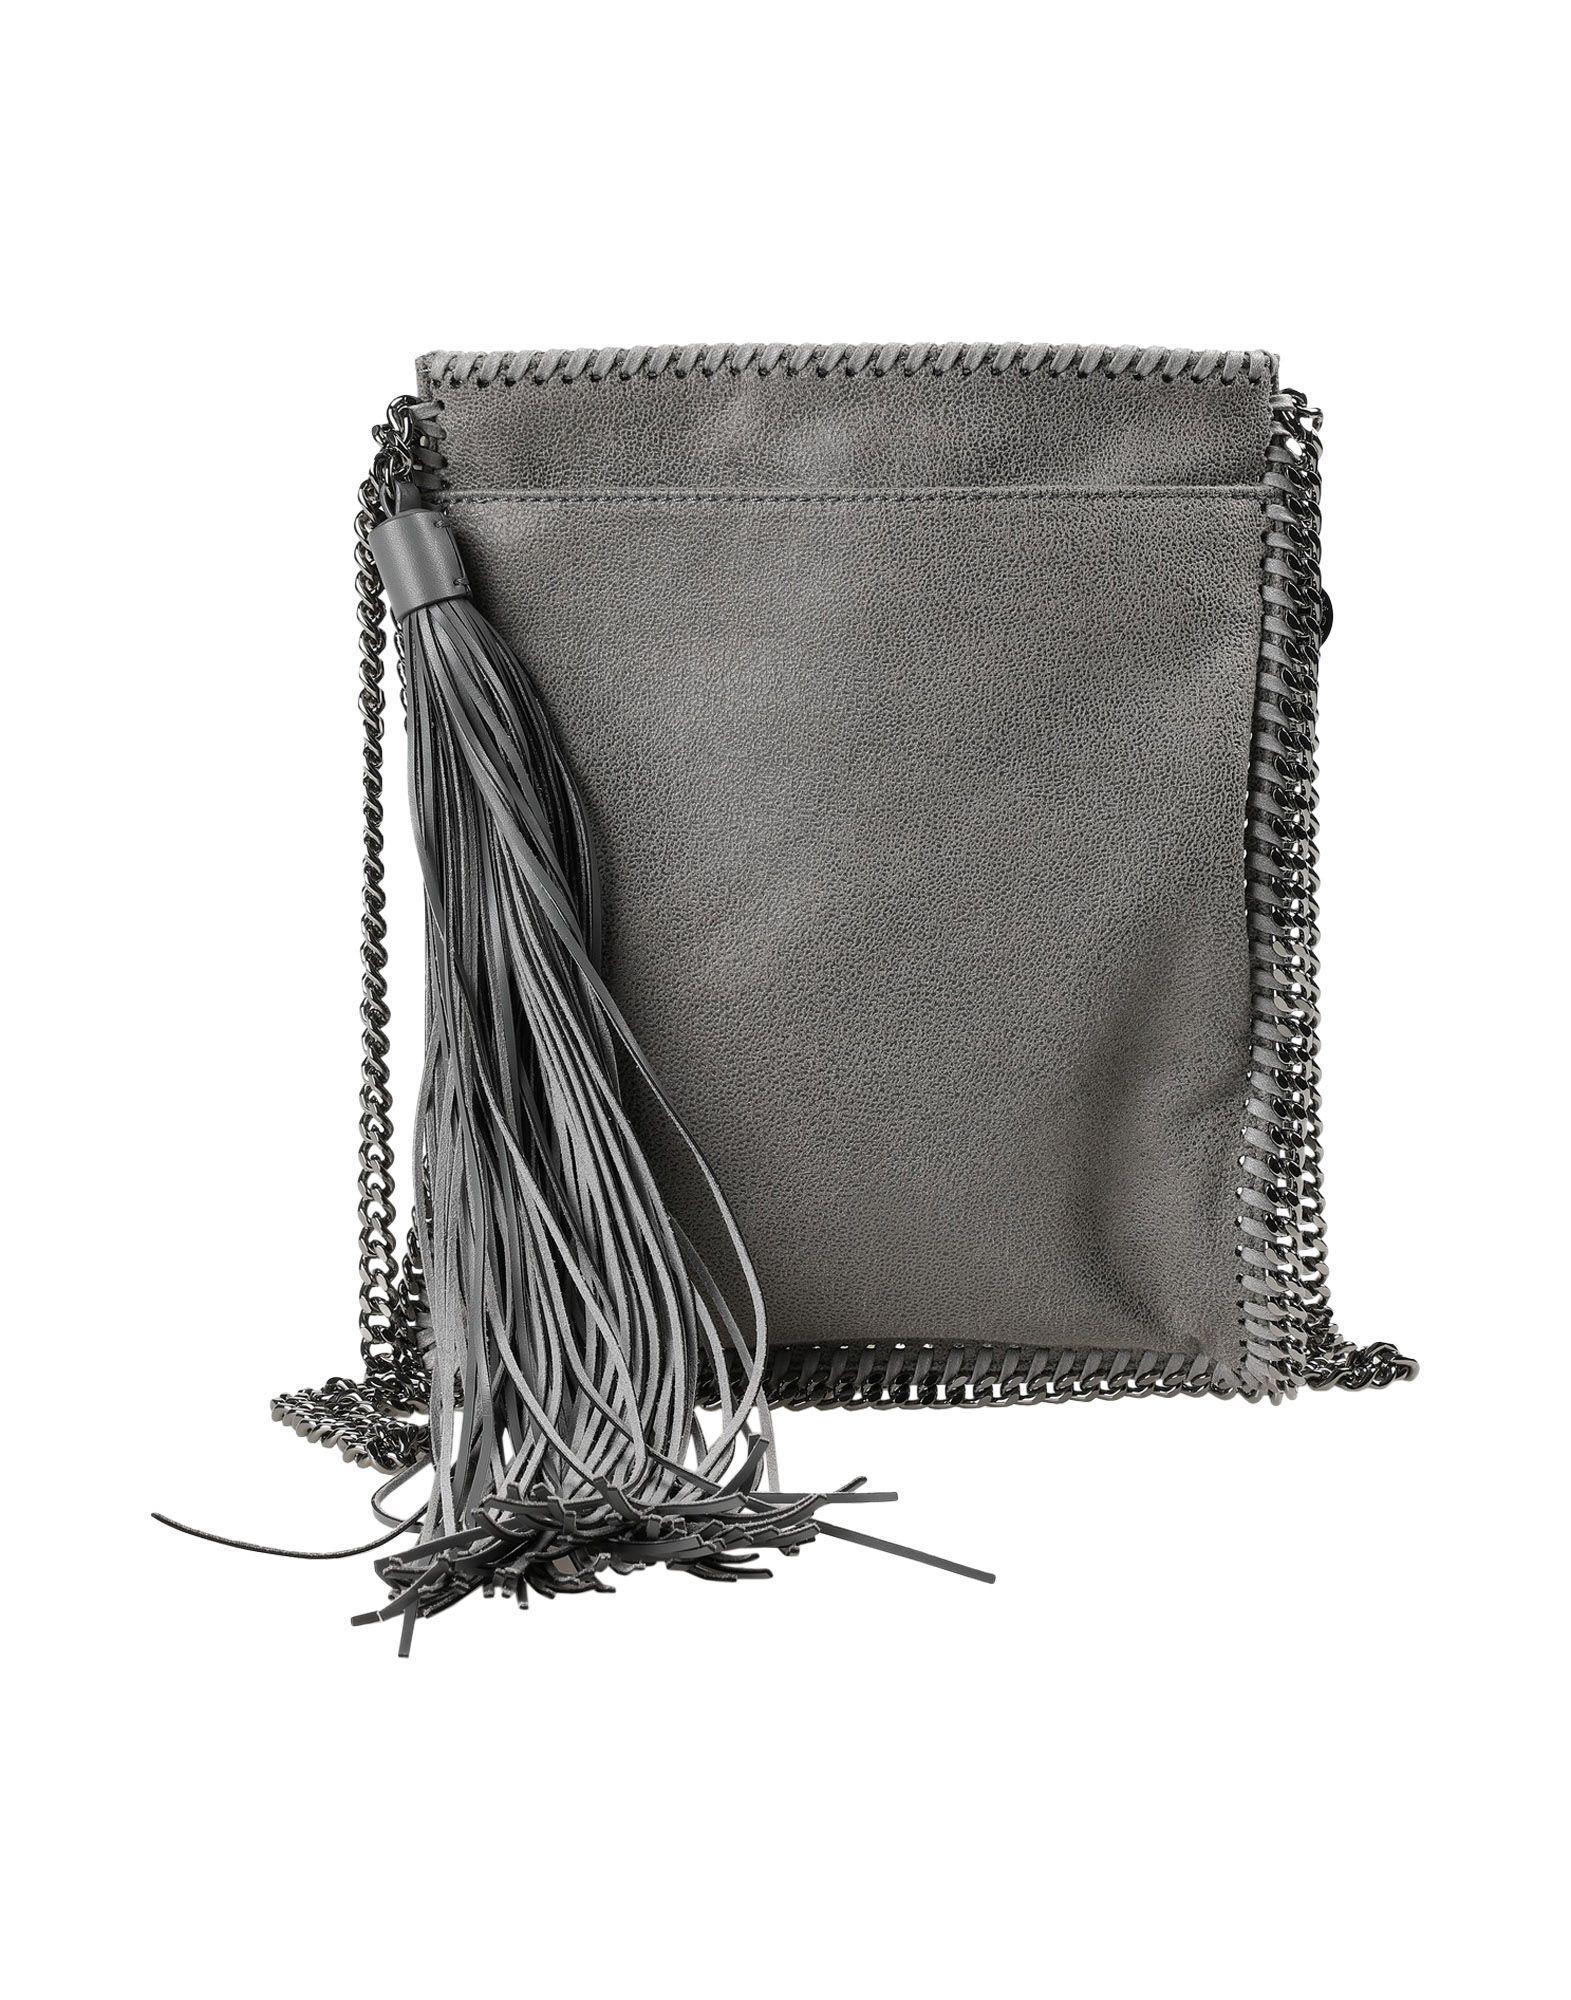 67b5ca219acd Lyst - Stella Mccartney Cross-body Bag in Gray